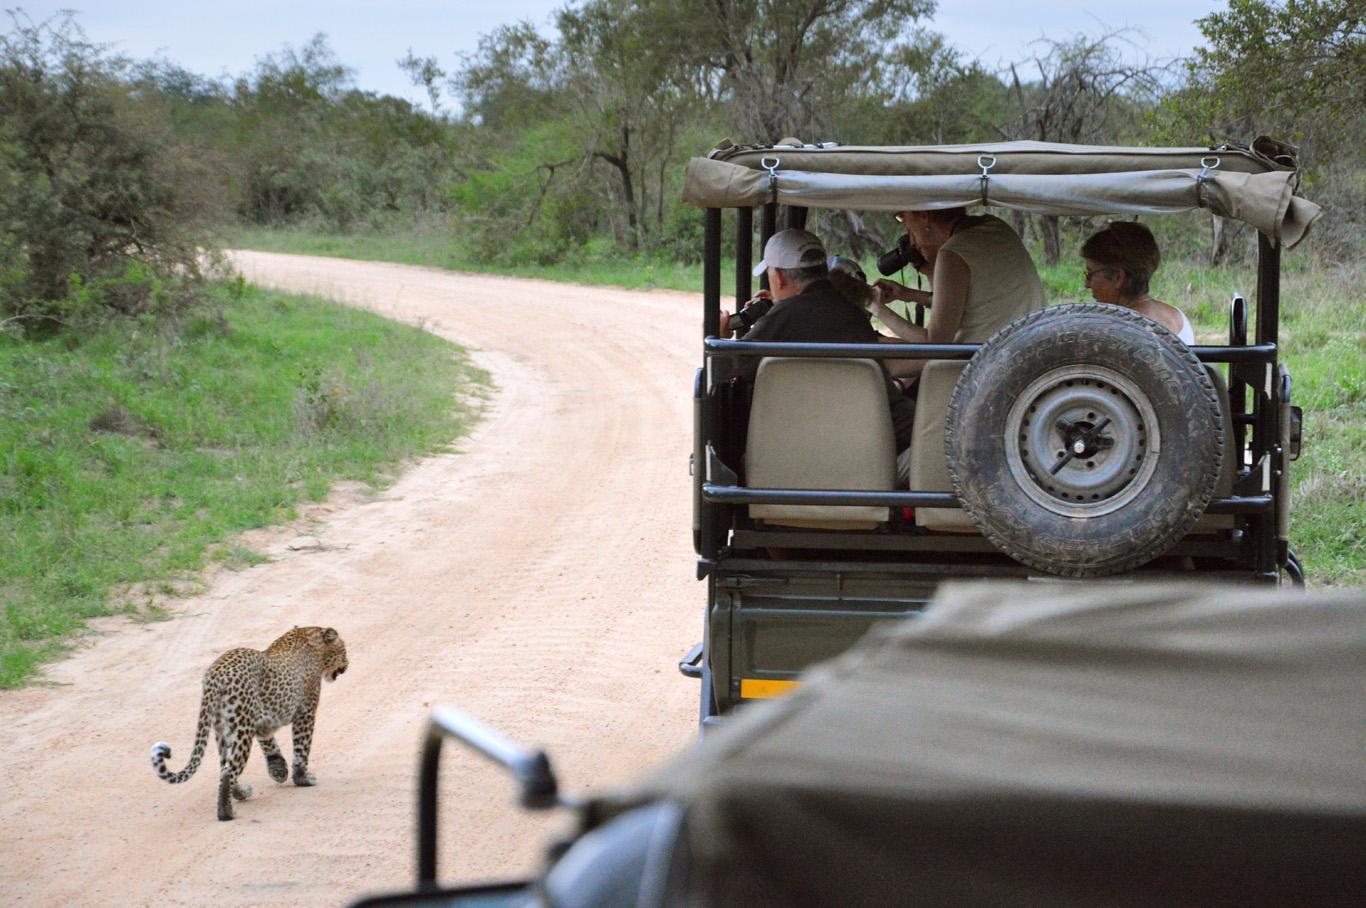 Leopard walking side by side with the trucks